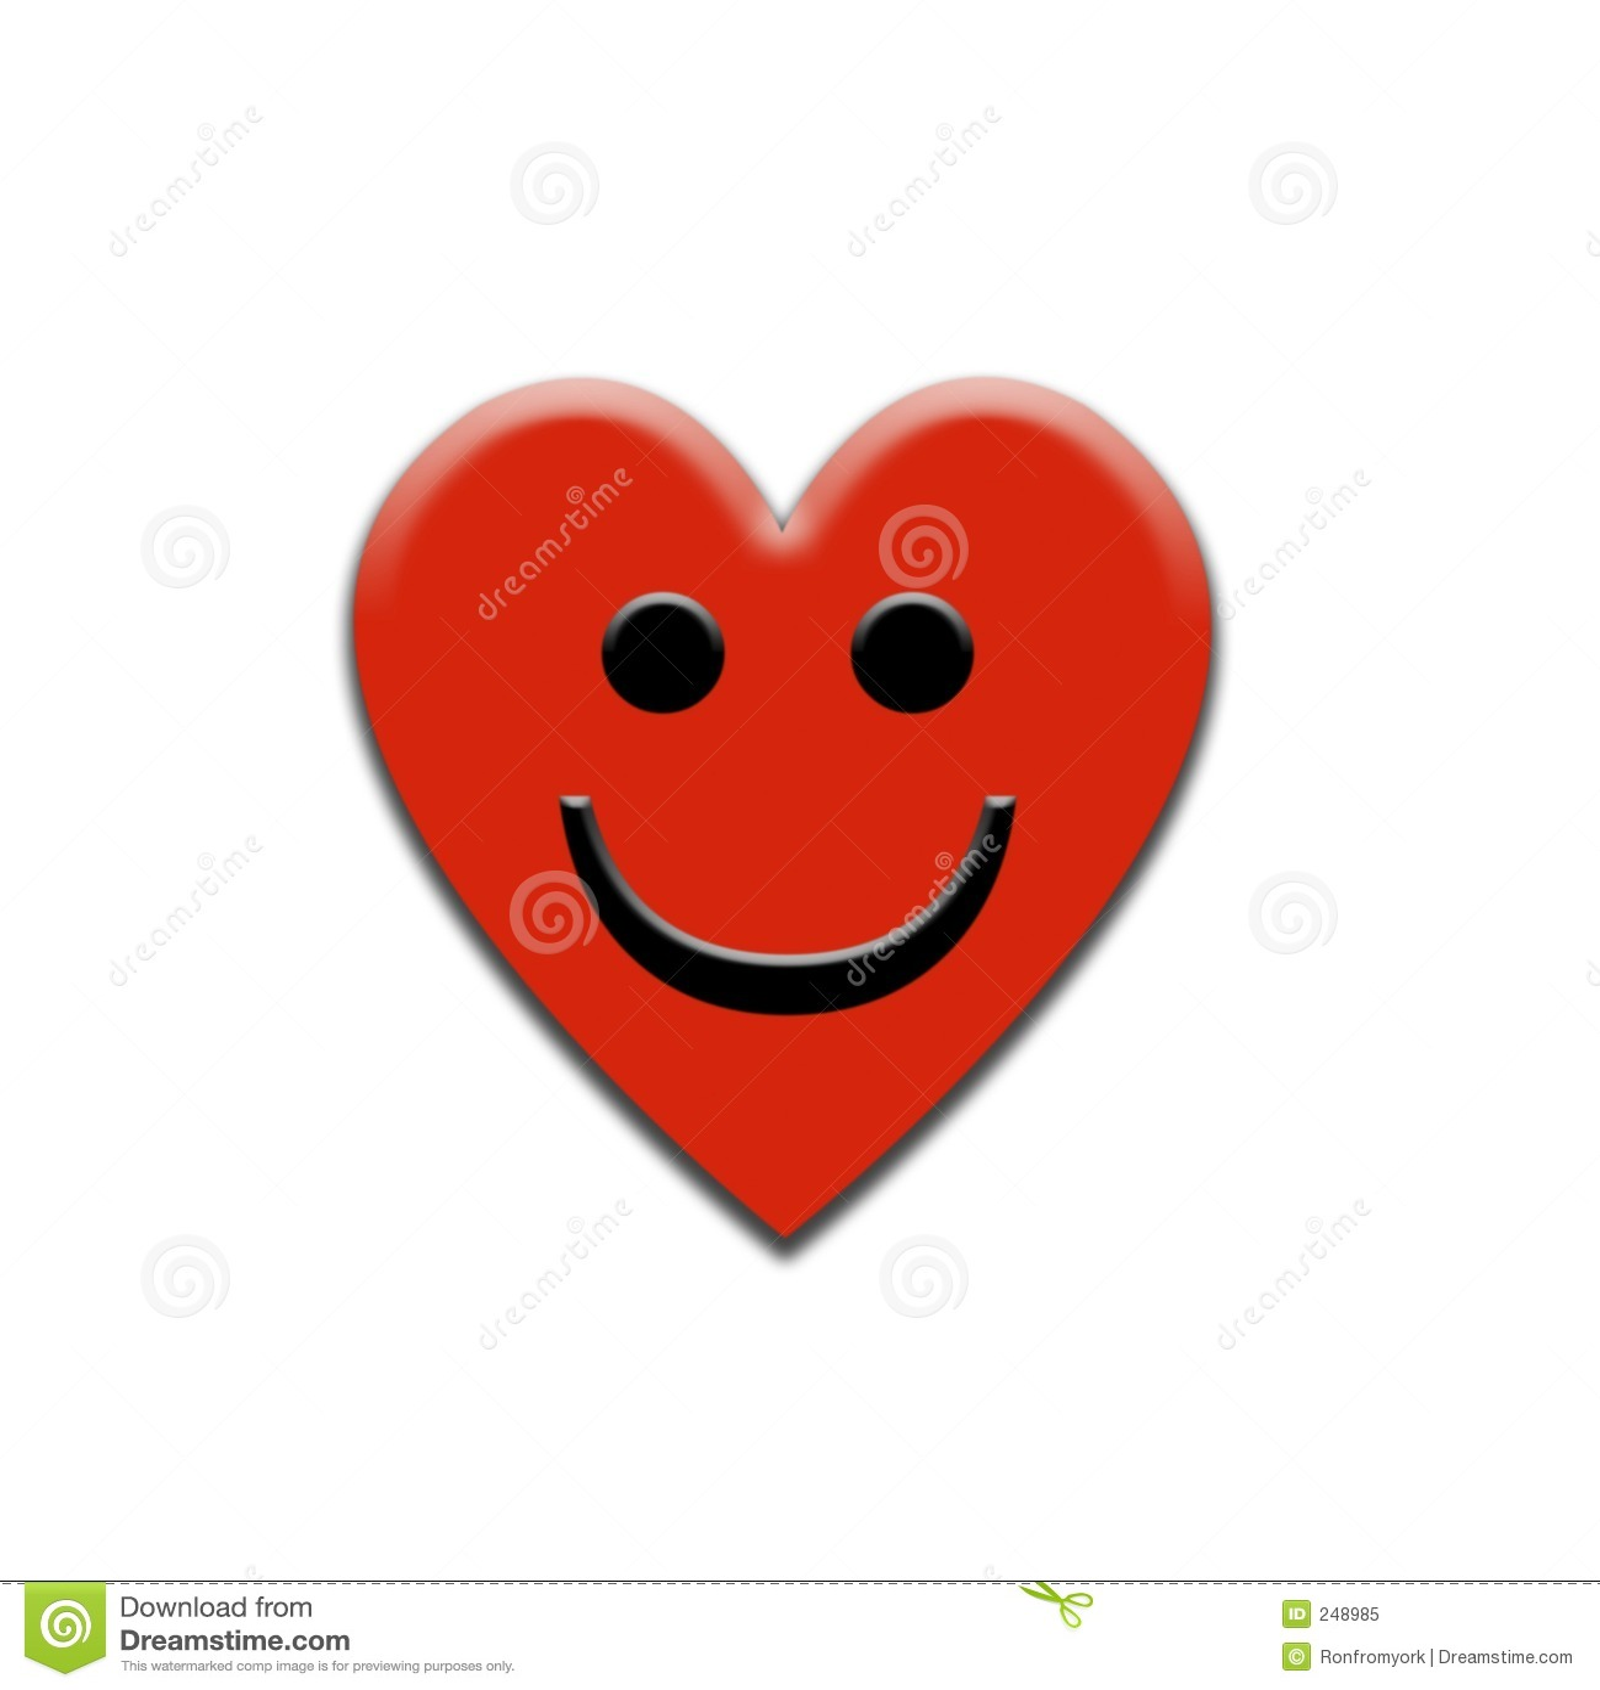 Smiling Heart Royalty Free Stock Photo - Image: 248985